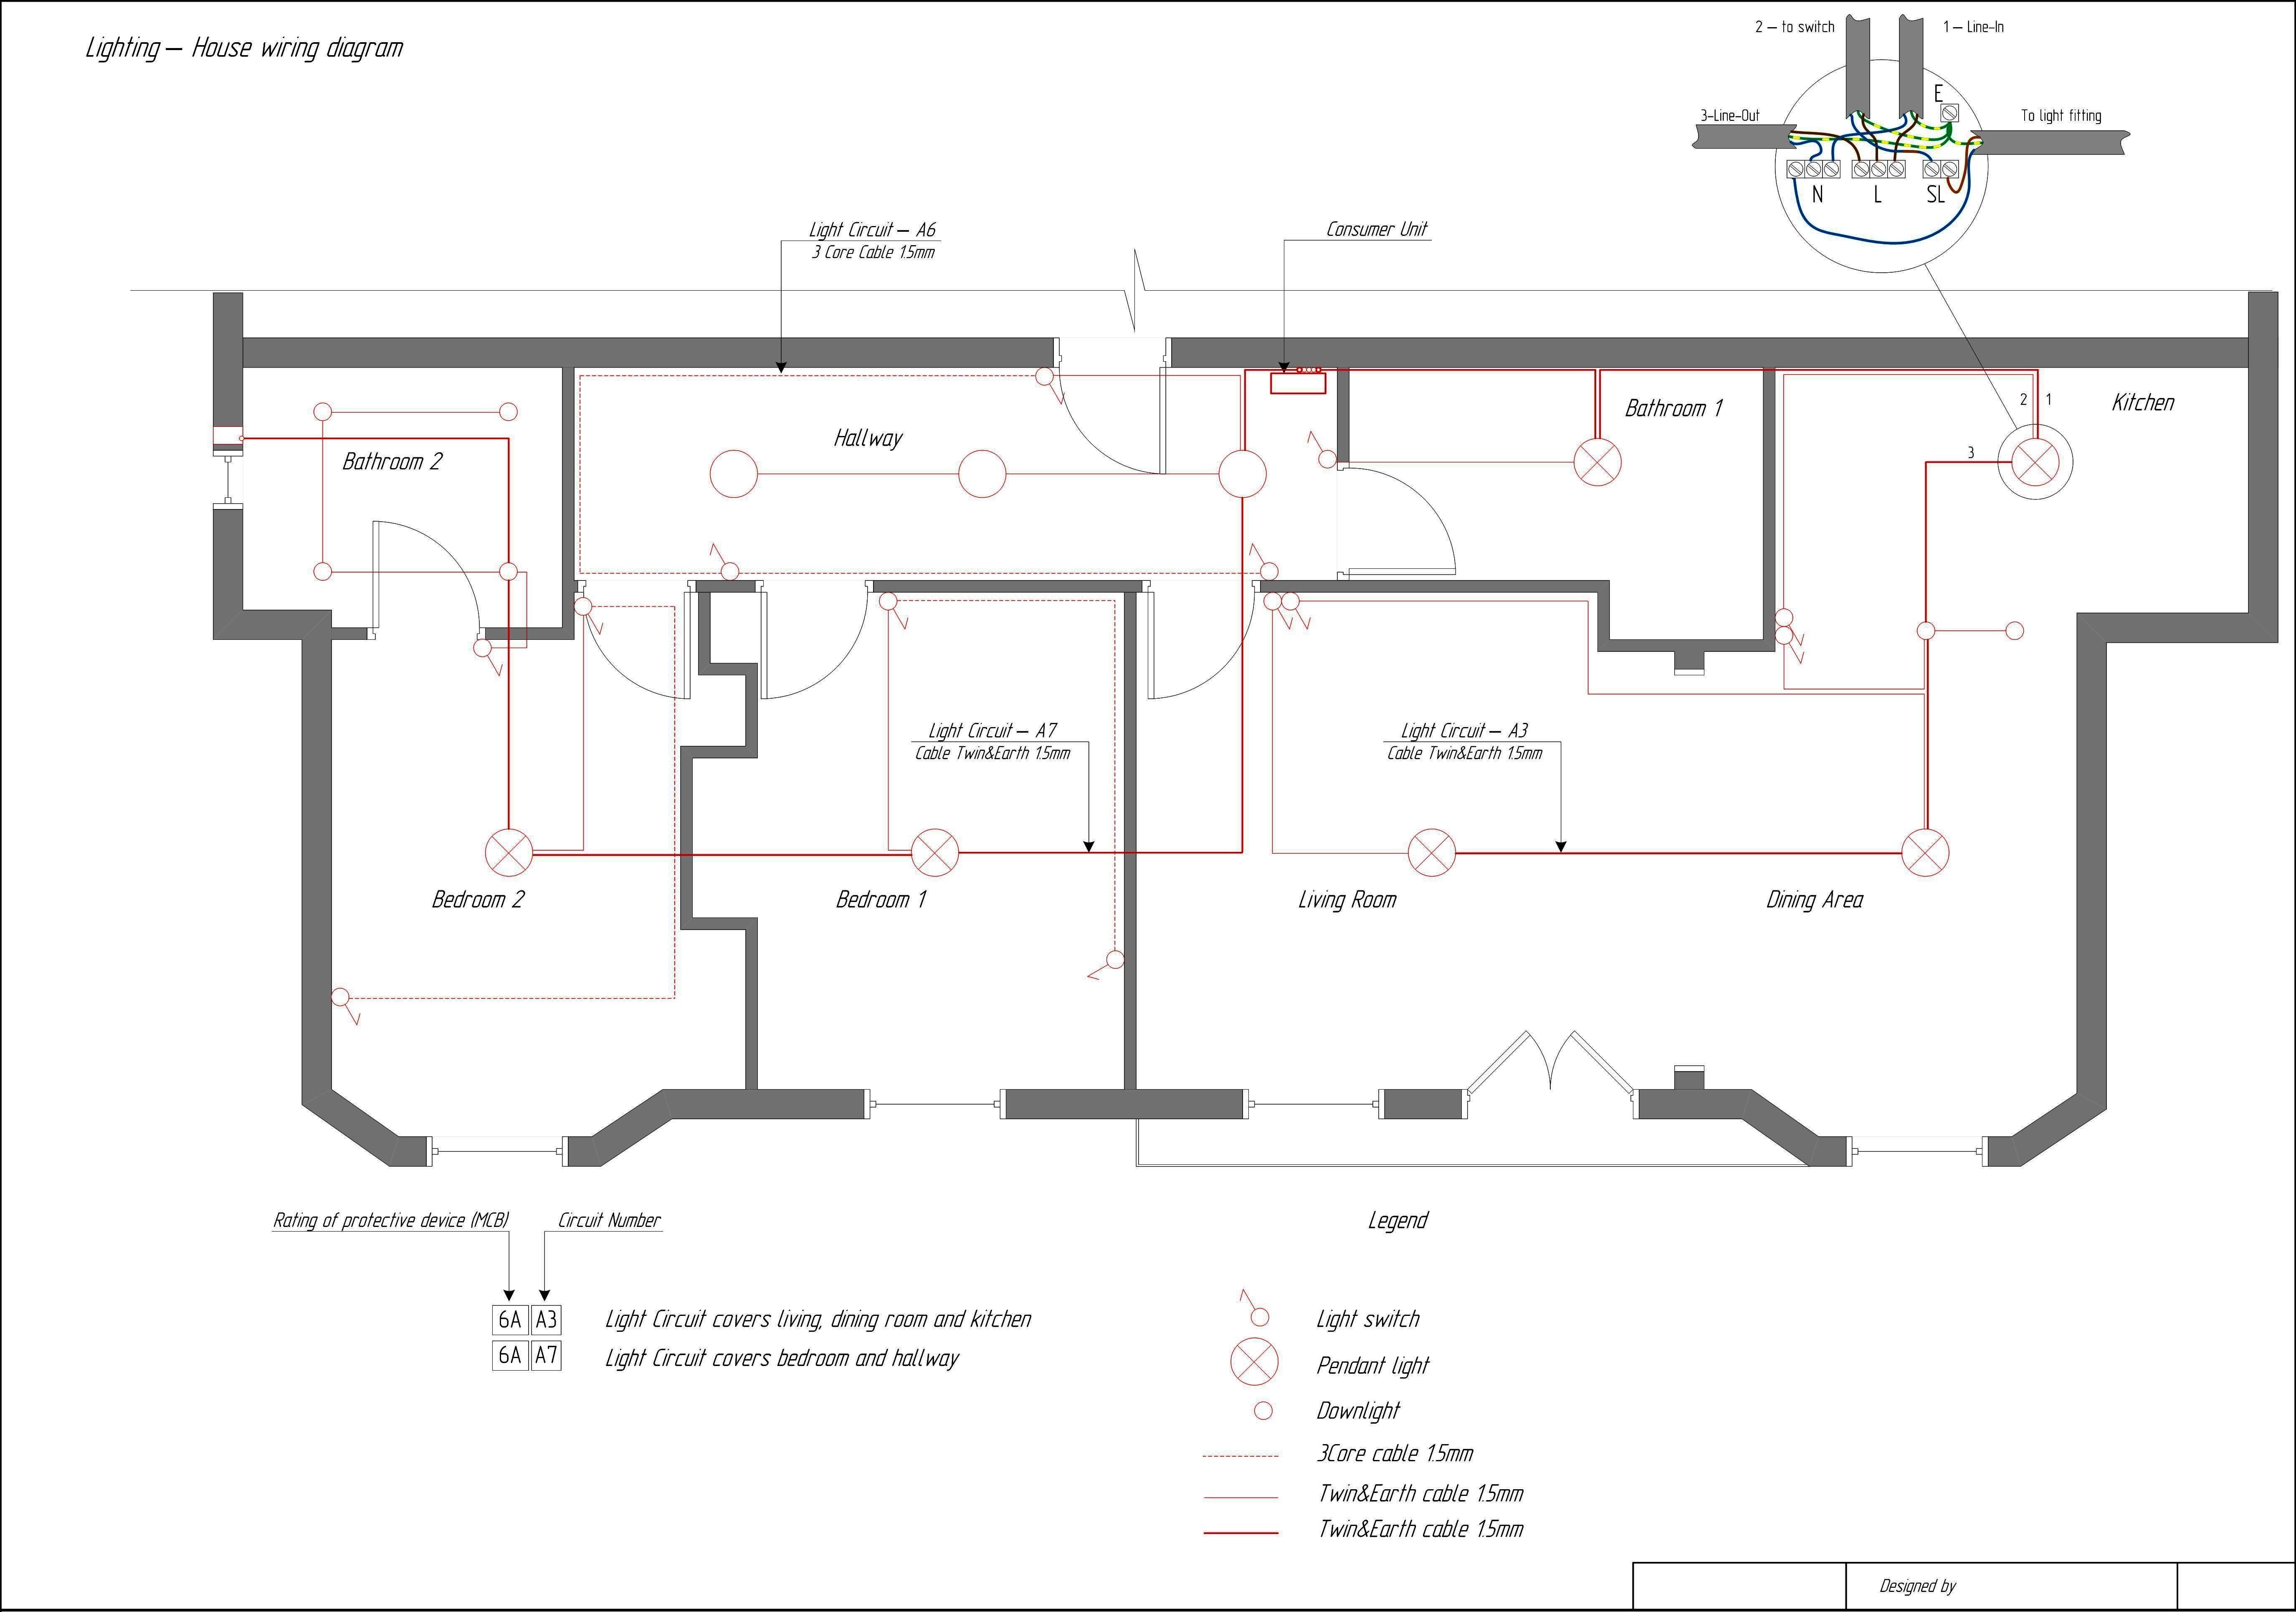 House Wiring Diagram House Wiring Diagrams Database